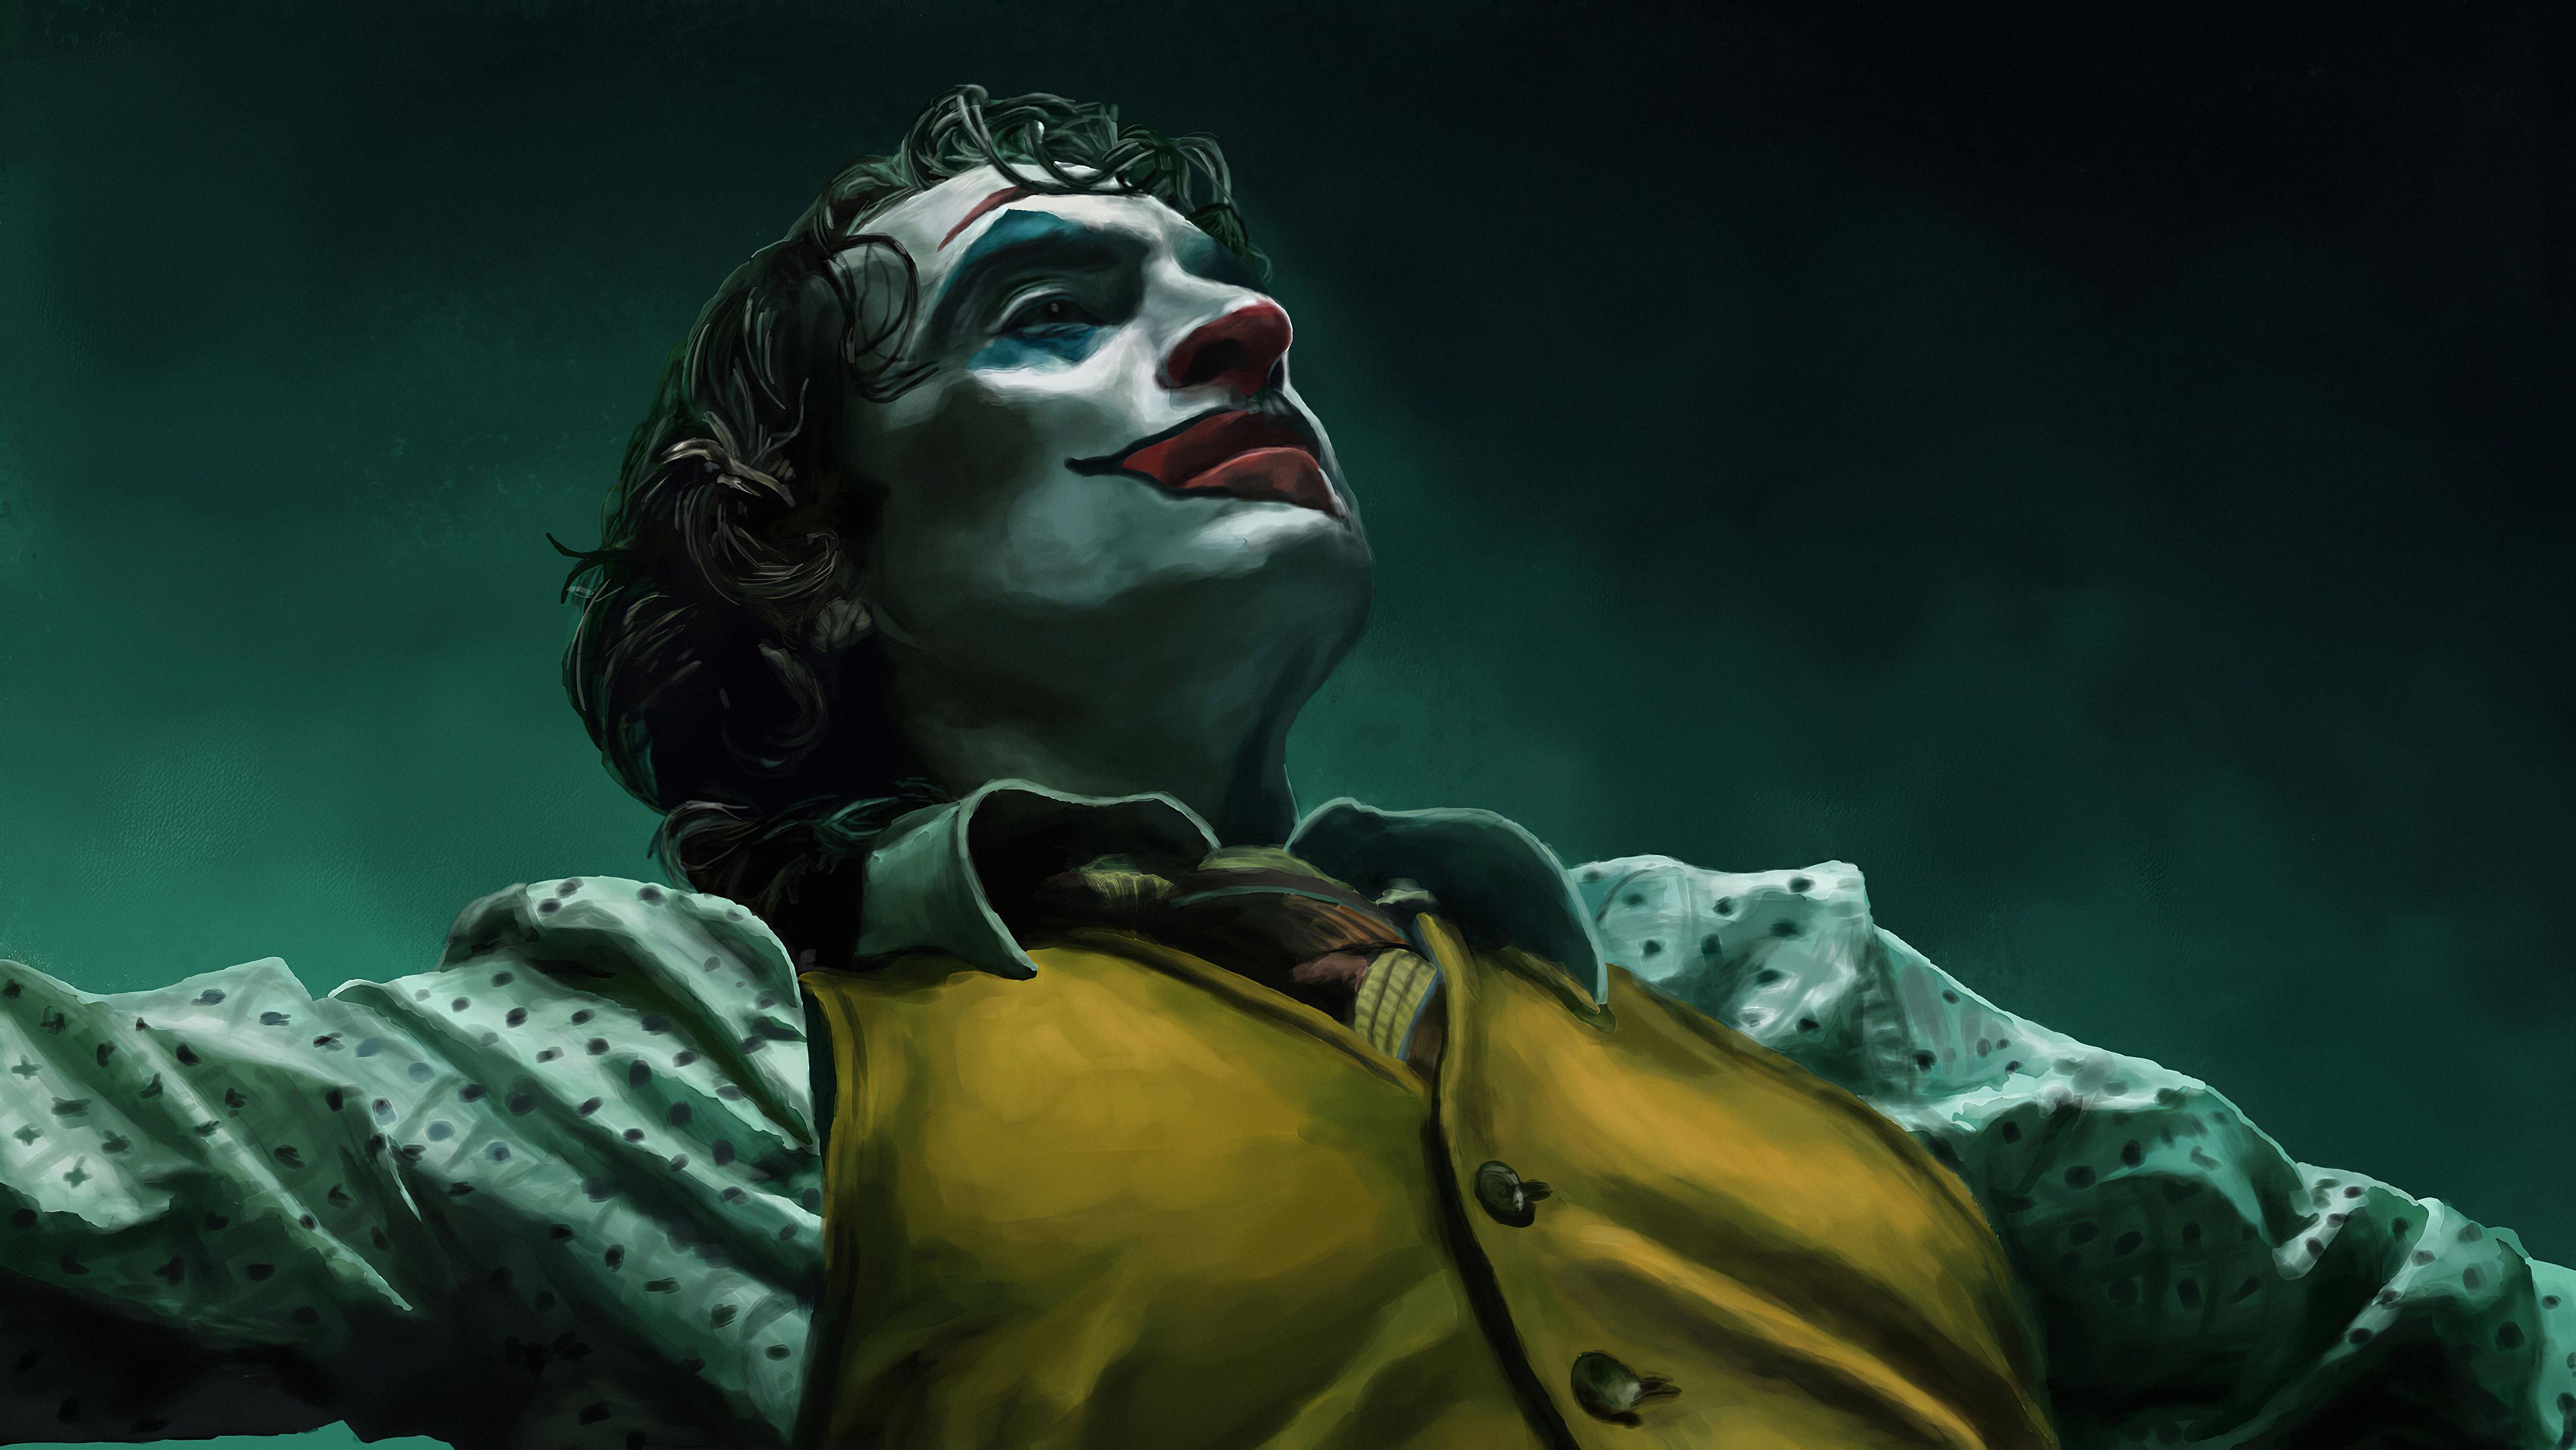 joker 2020 1580588344 - Joker 2020 - joker phone wallpaper 4k hd, joker hd wallpaper 4k, joker art wallpaper hd 4k, Joker 2020 wallpaper 4k hd, 4k wallpaper joker